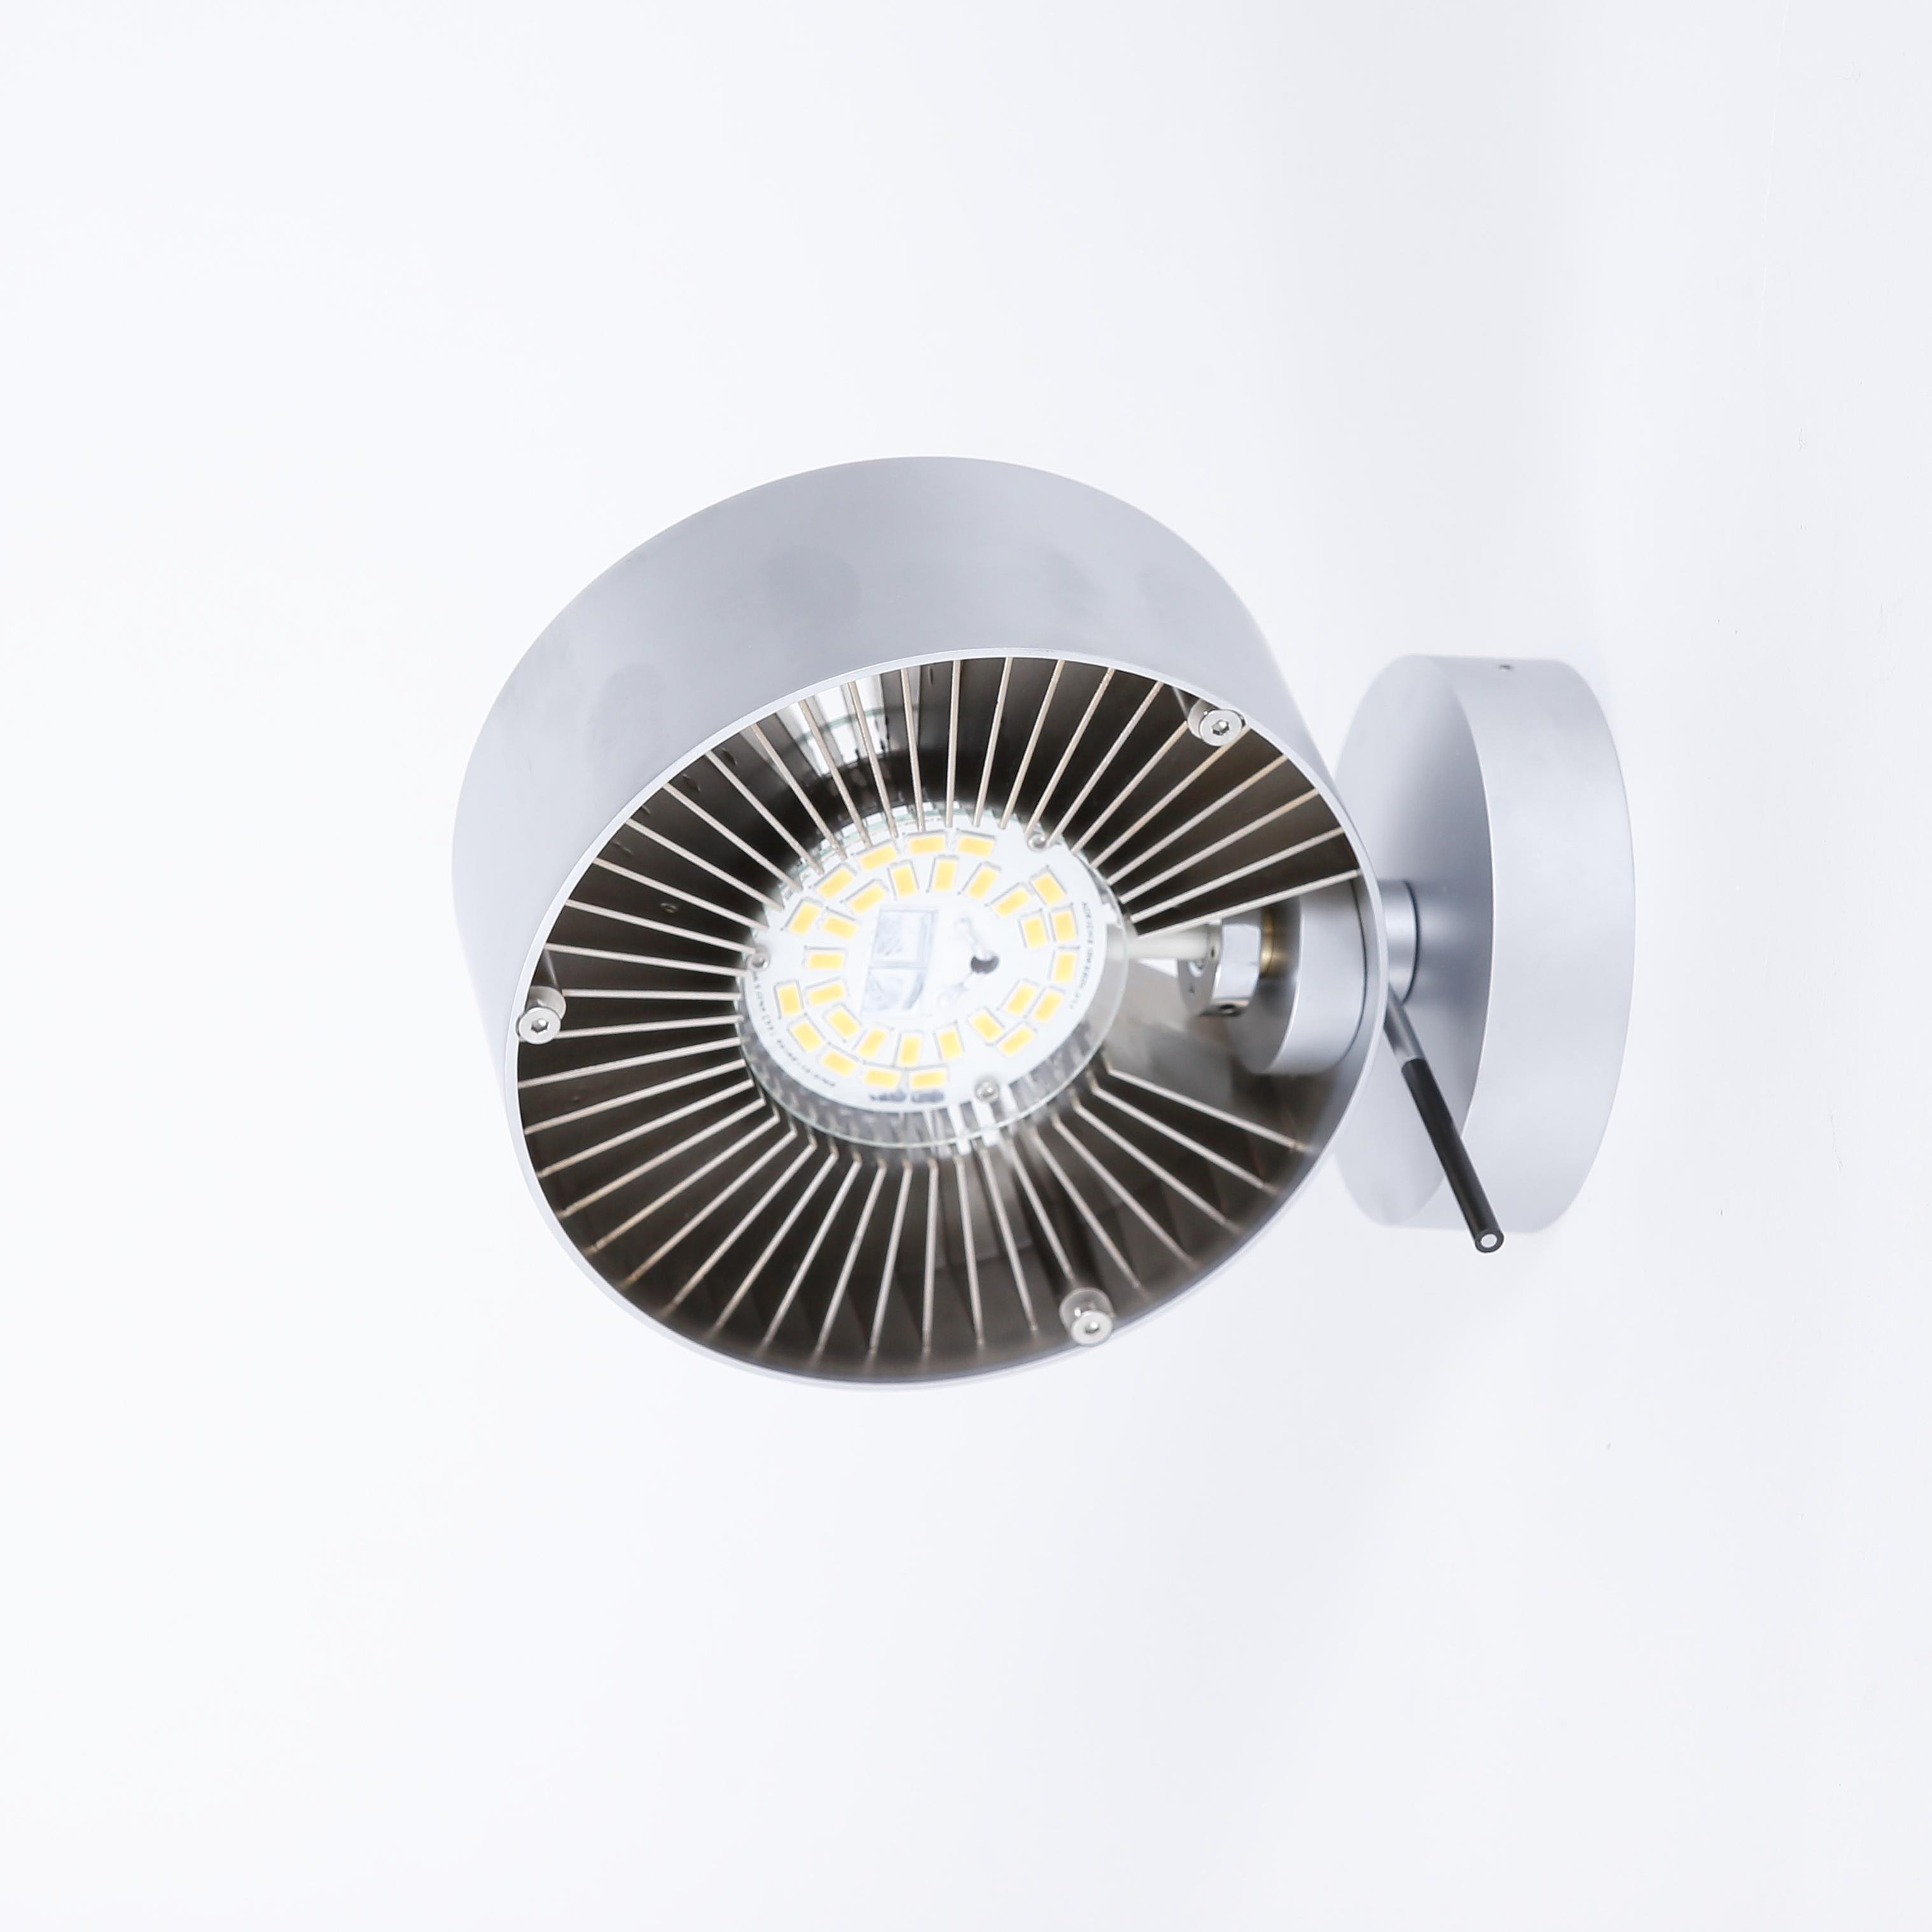 top light geh use zur wandleuchte puk maxx wall led. Black Bedroom Furniture Sets. Home Design Ideas